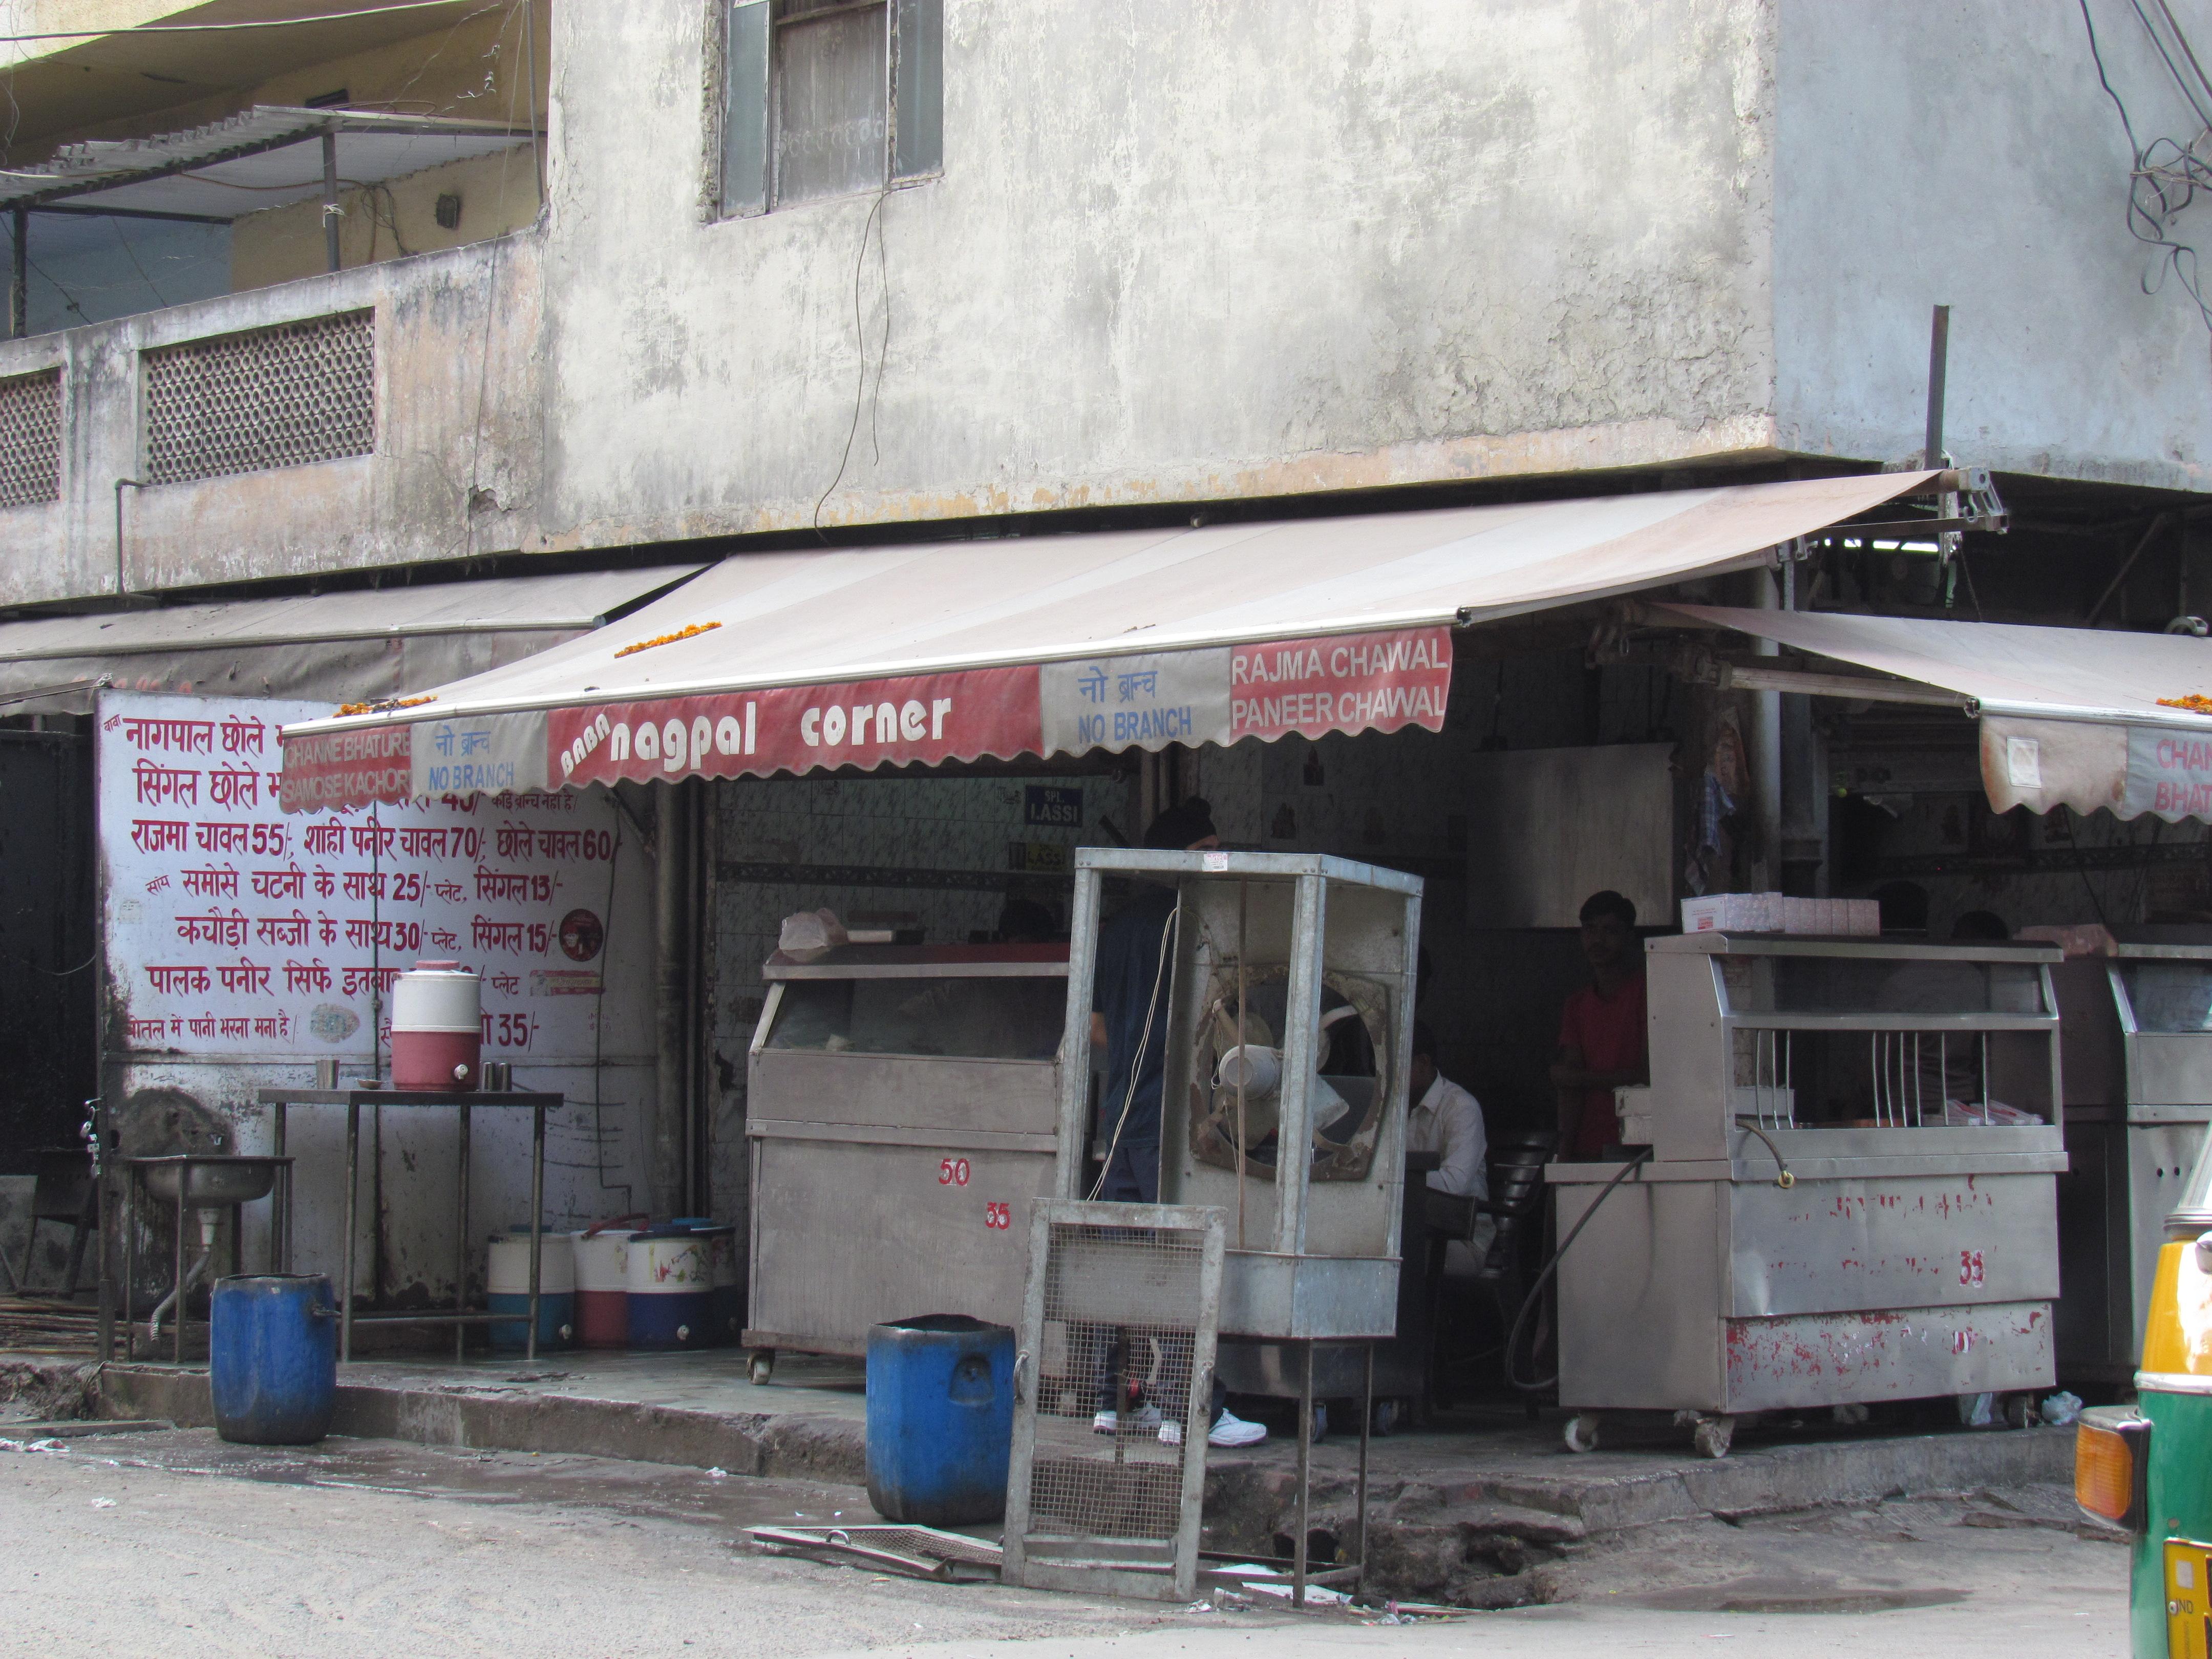 Baba Nagpal Corner 7 25 Old Double Storey Gupta Market Lajpat